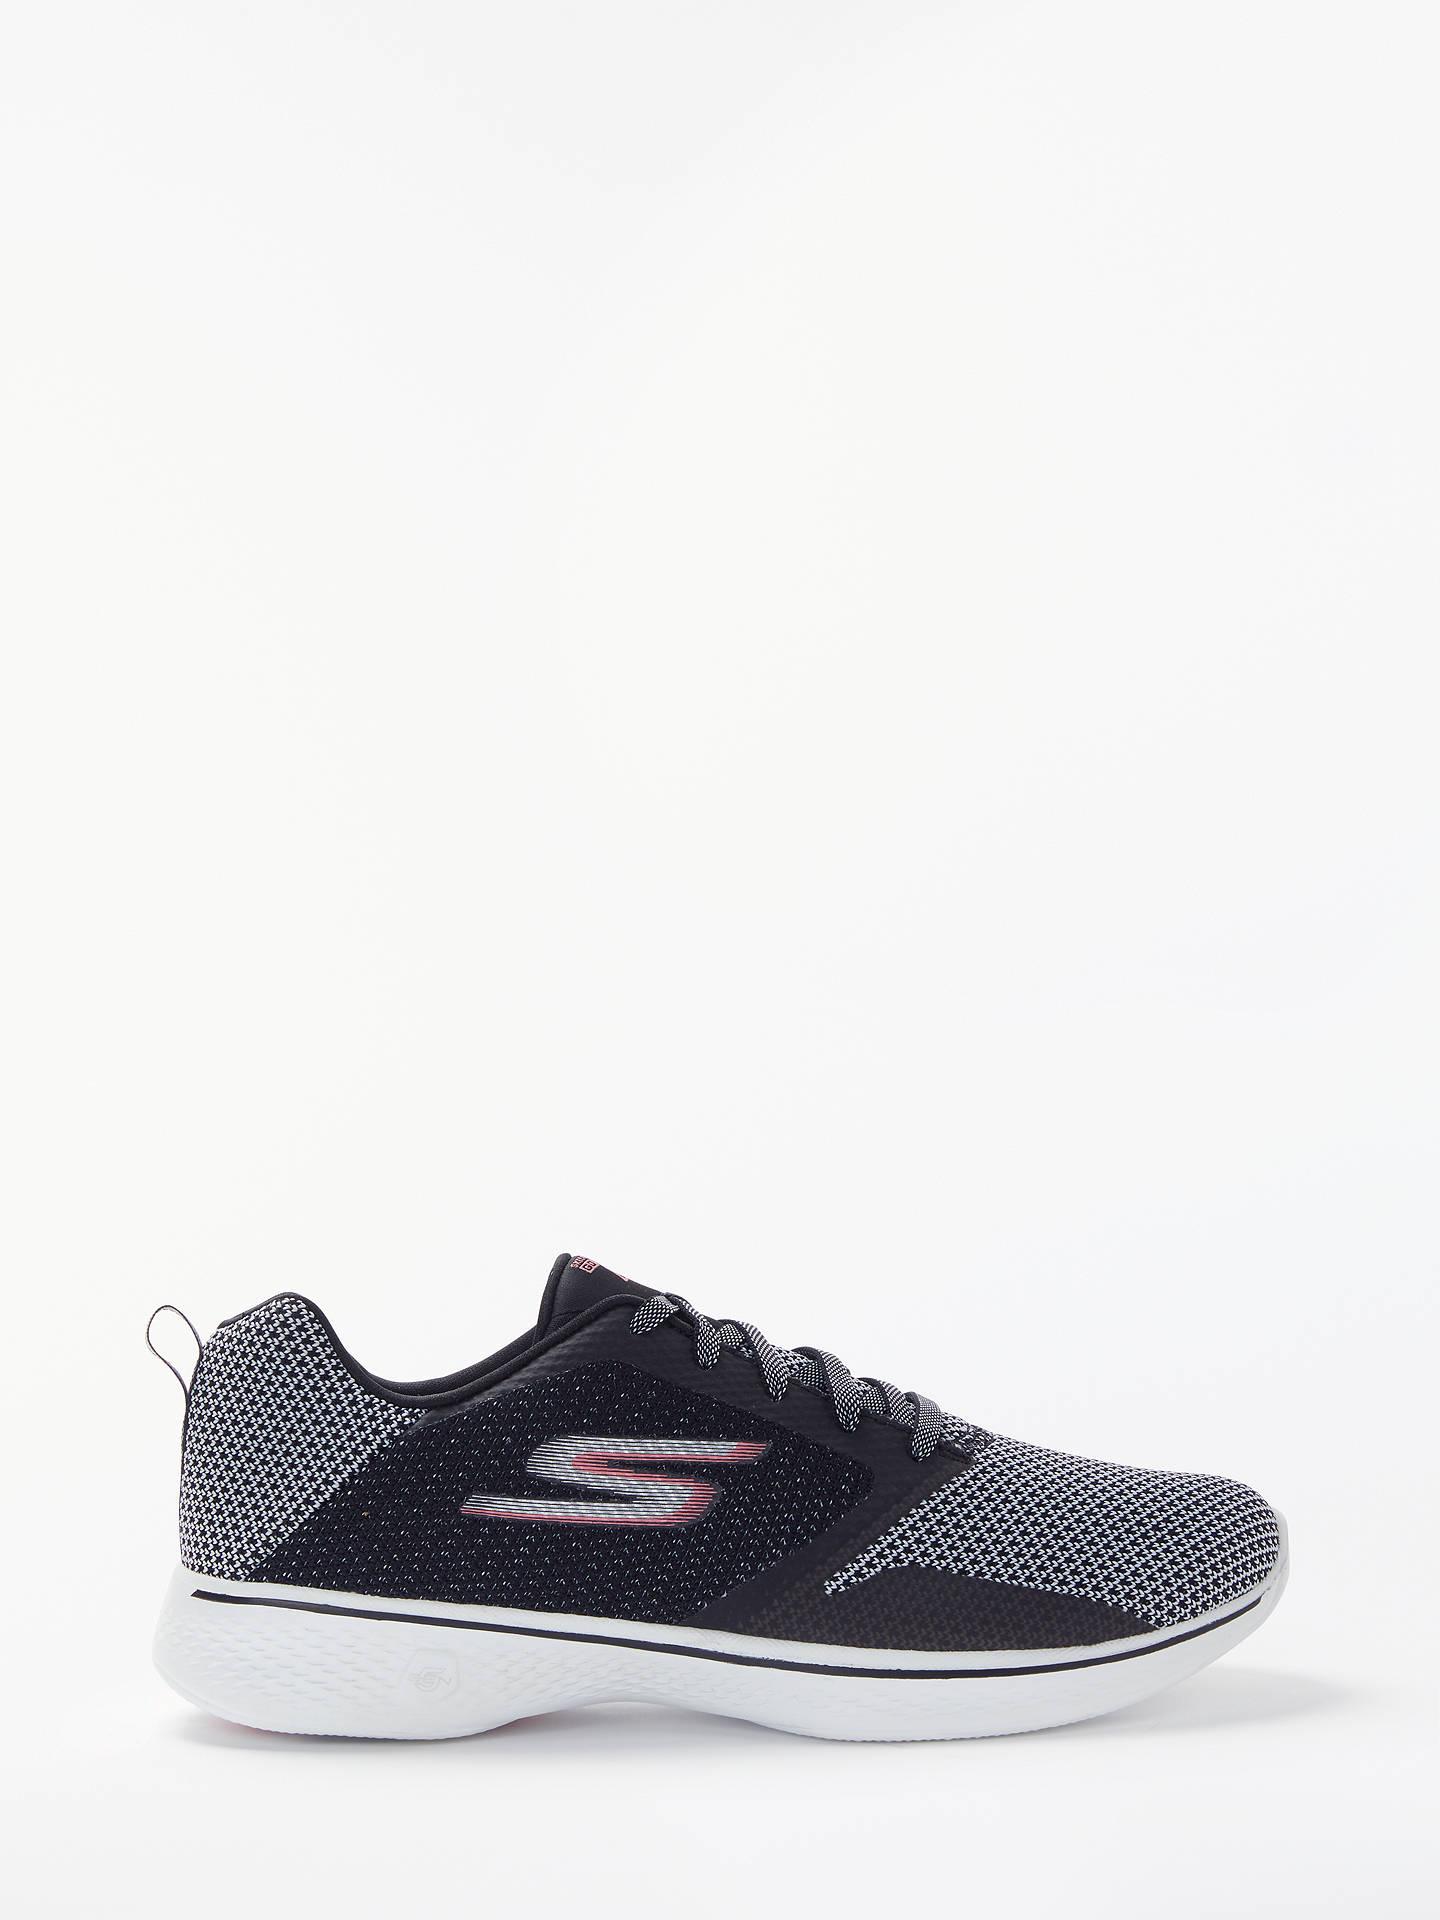 d9dbb040e25b Buy Skechers Go Walk 4 Lace Up Trainers